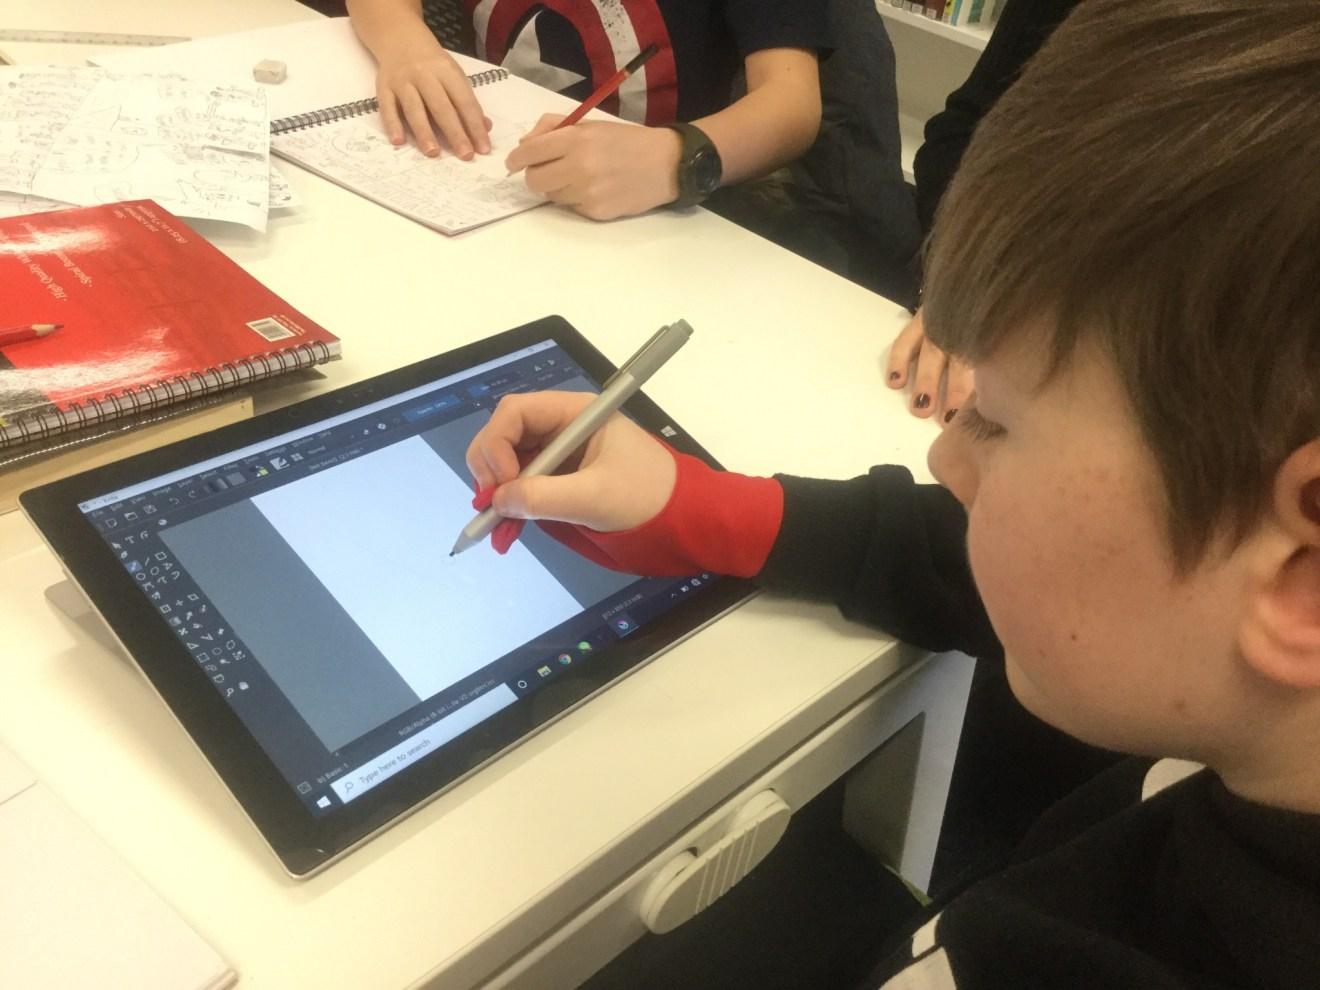 Splash Panel attended using iPad and Apple Pencil.